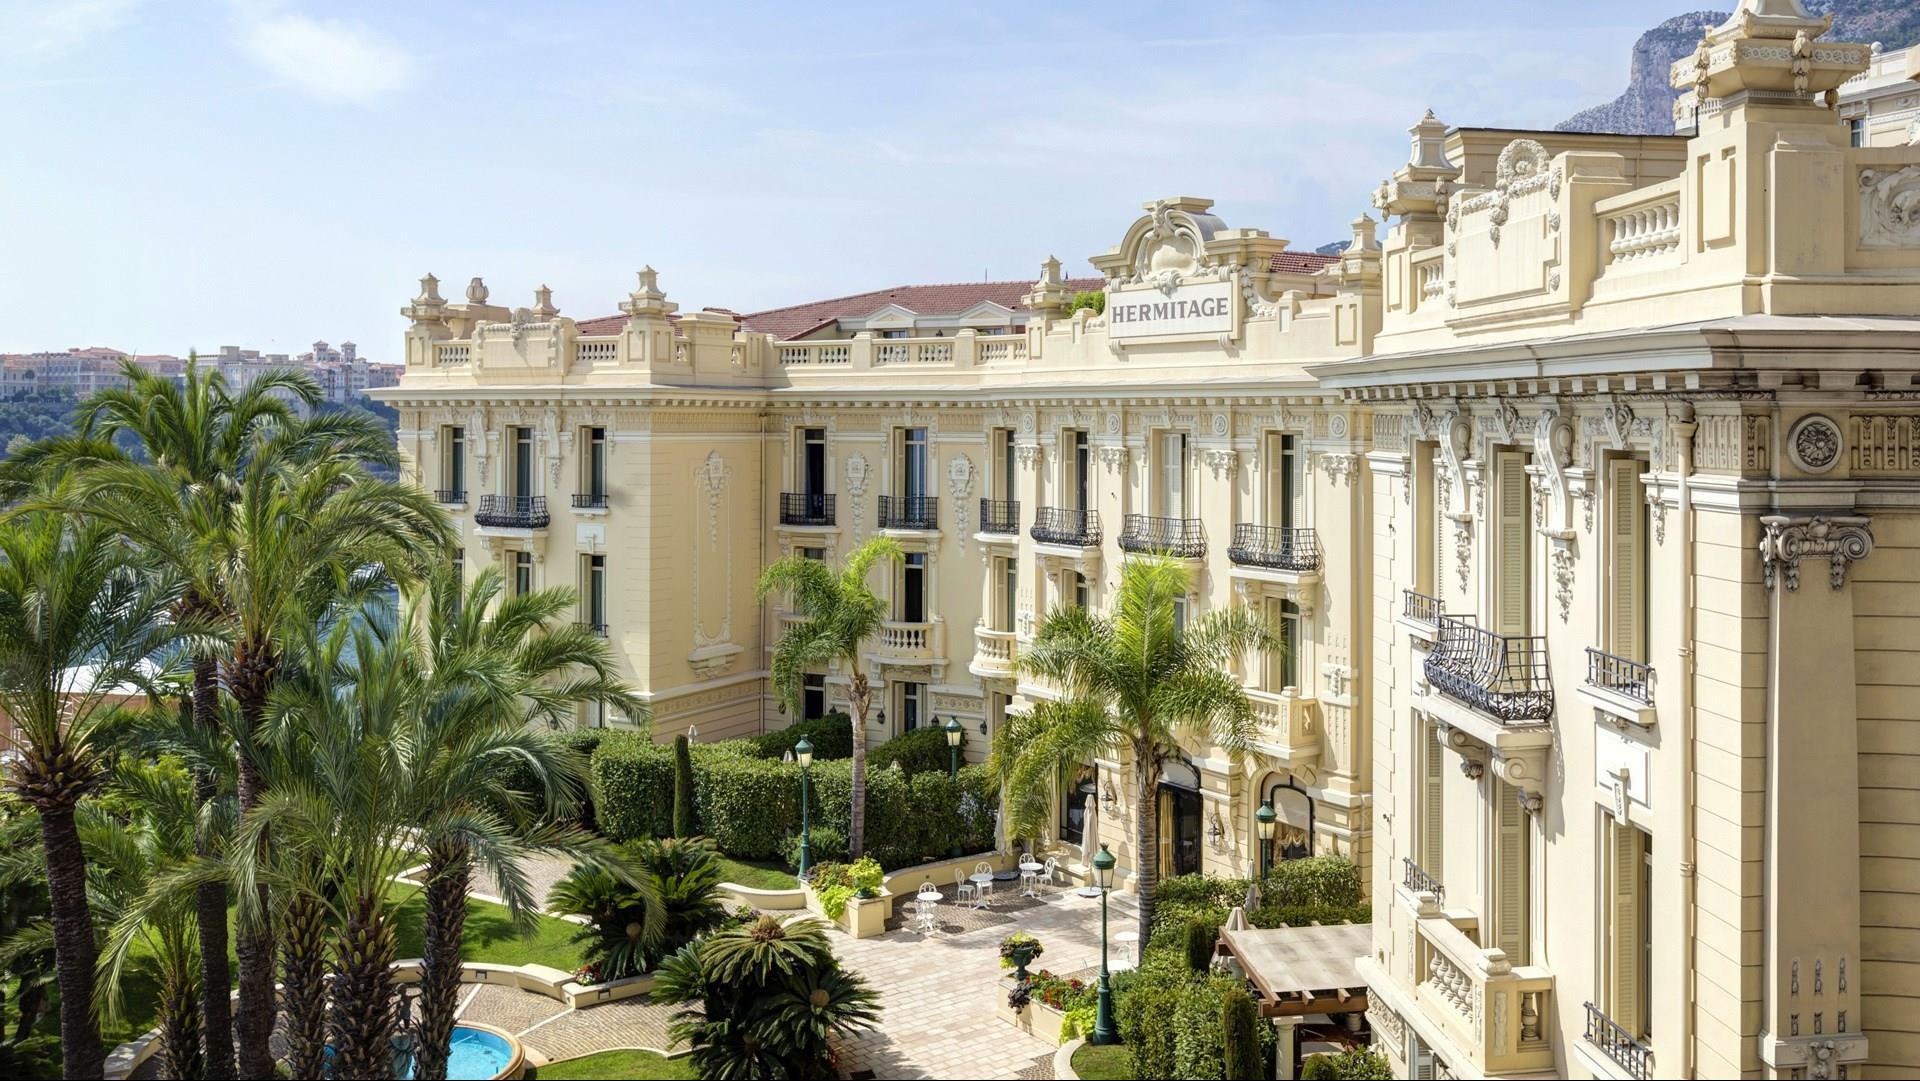 Meetings And Events At Hotel Hermitage Monte-Carlo 5*, Monte ... avec Salon De Jardin Casino